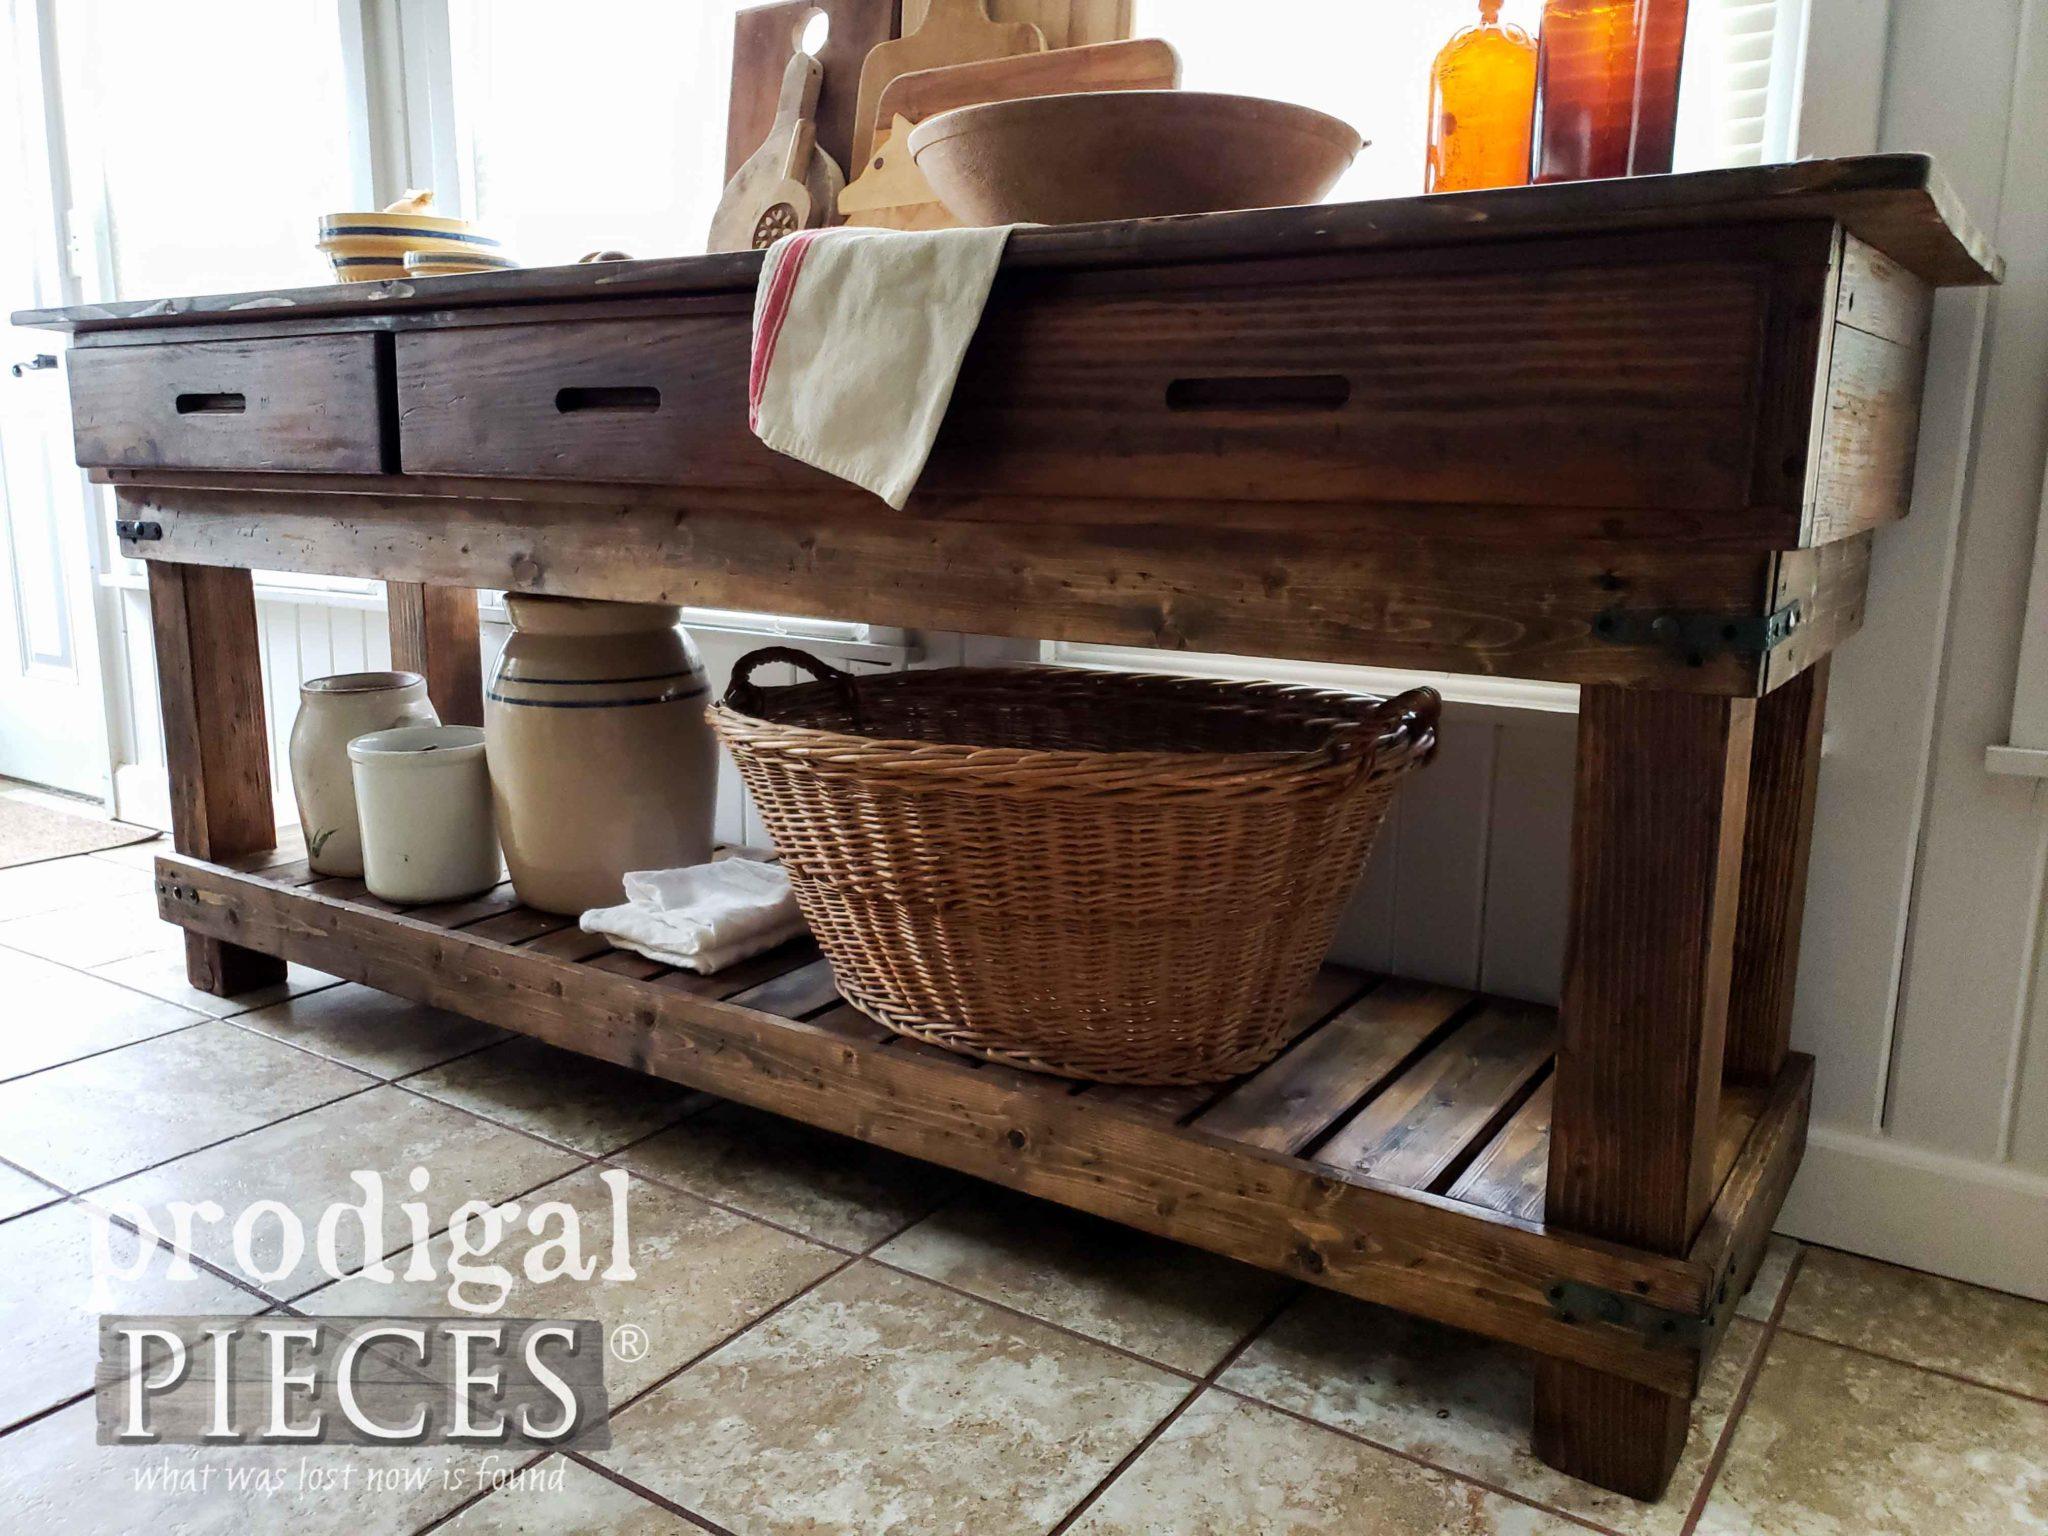 Handmade Farmhouse Workbench Created by Larissa of Prodigal Pieces | prodigalpieces.com